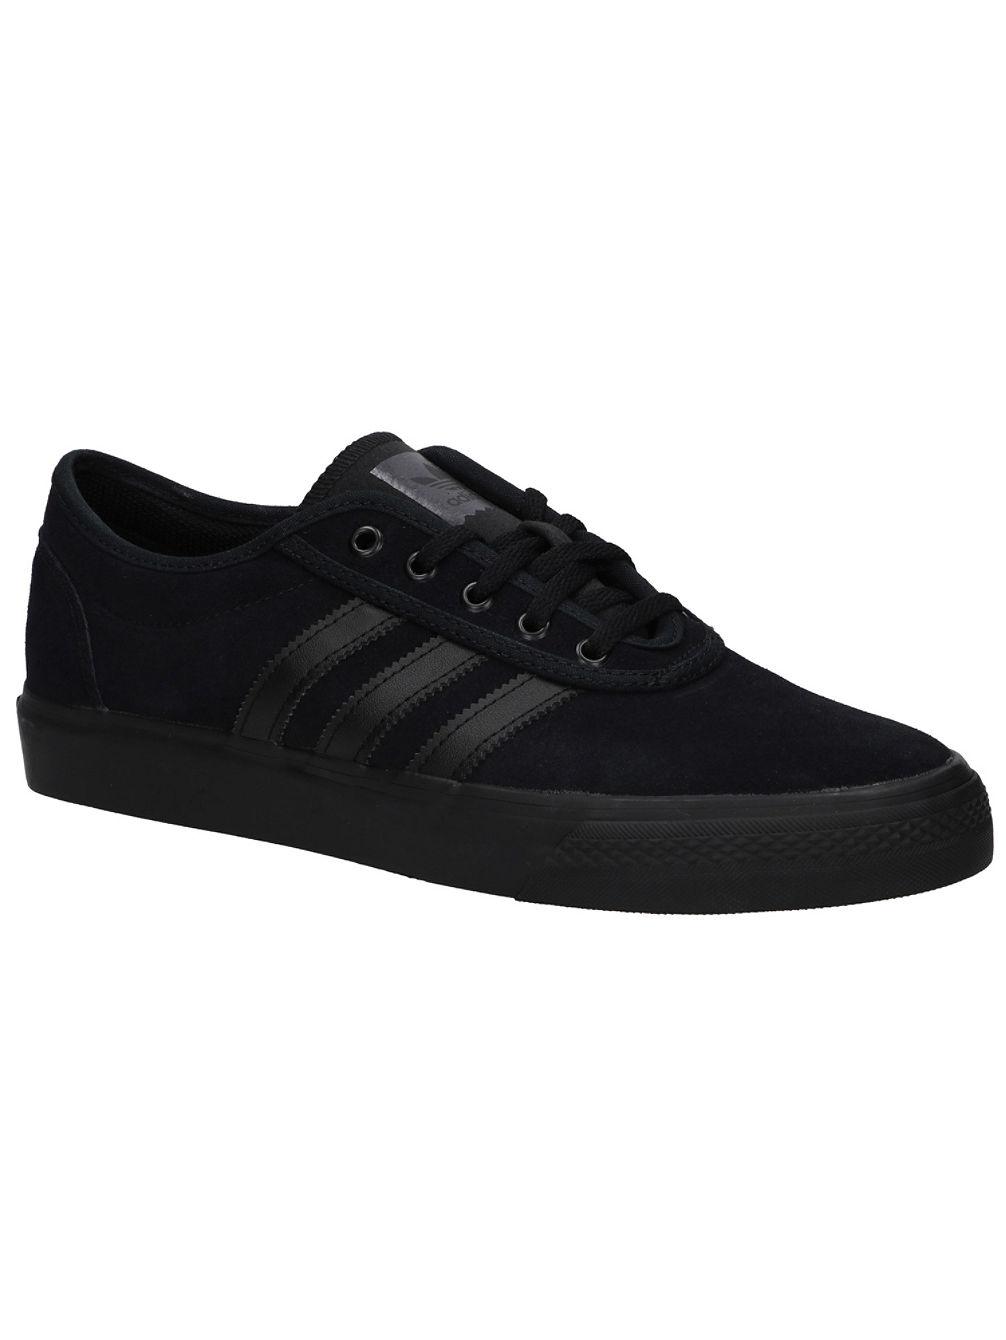 Buy Adidas Skateboarding Adi Ease Skate Shoes Online At